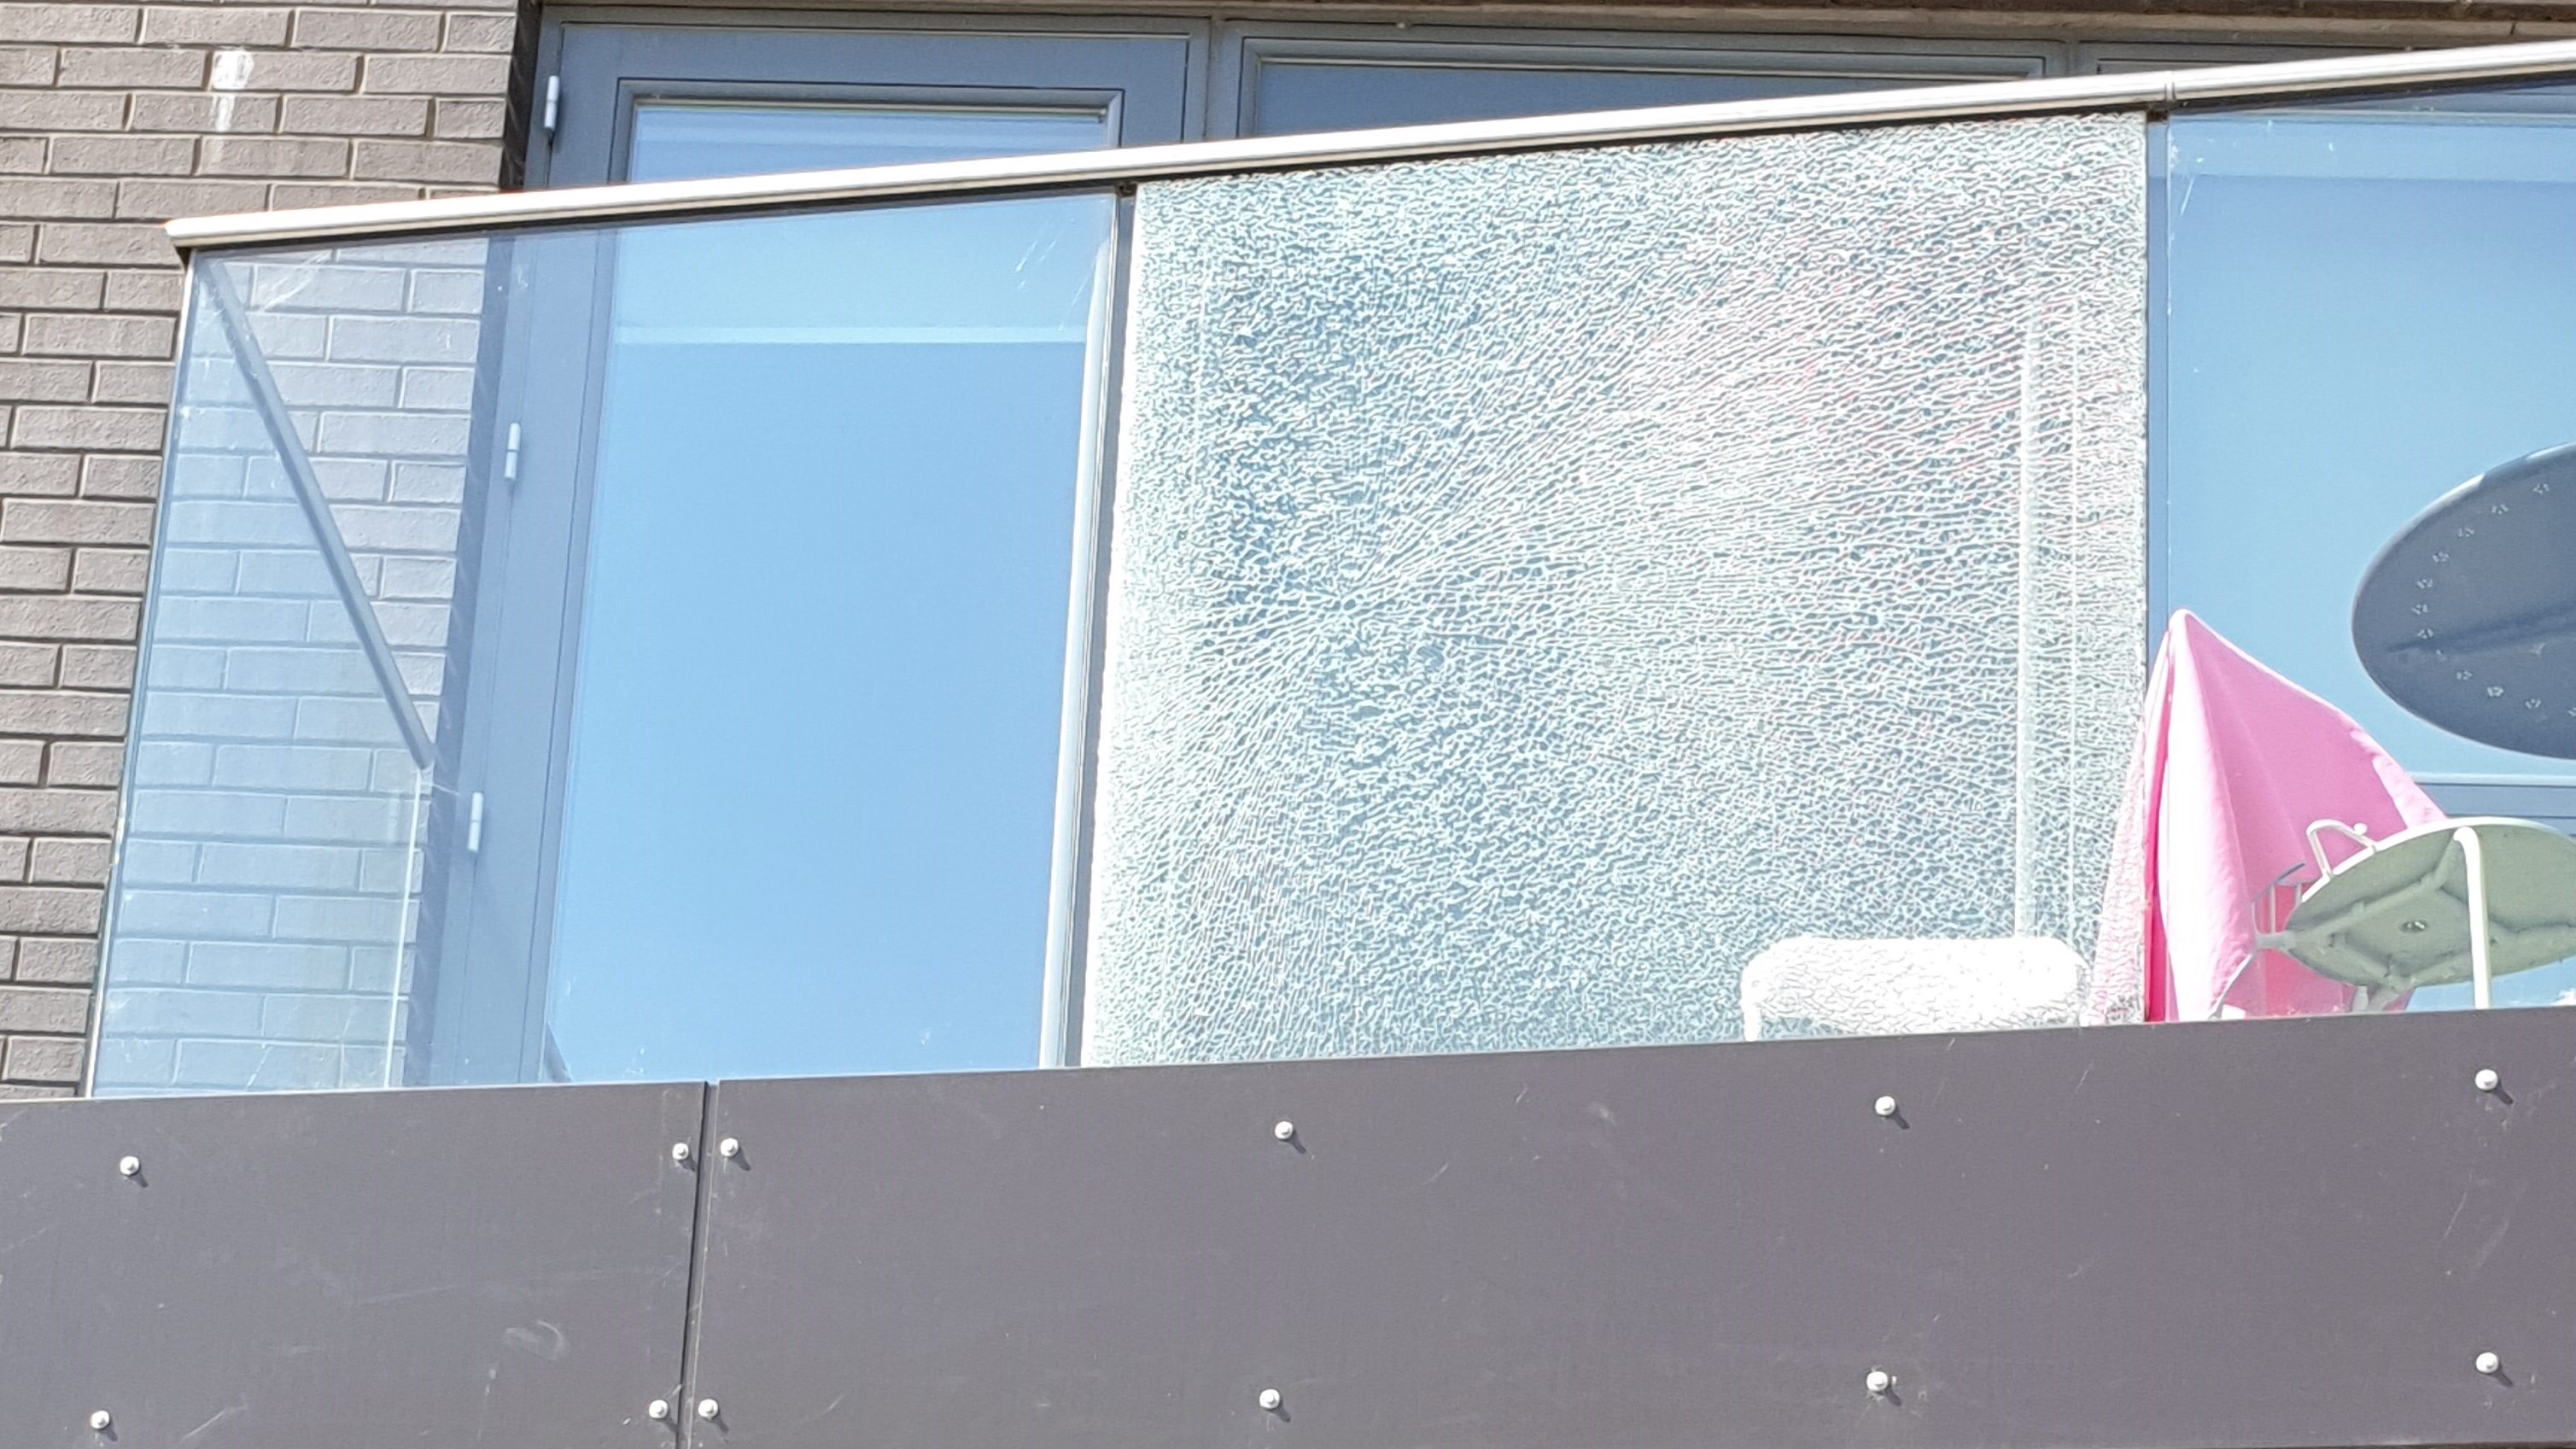 balustrade glazing replacement